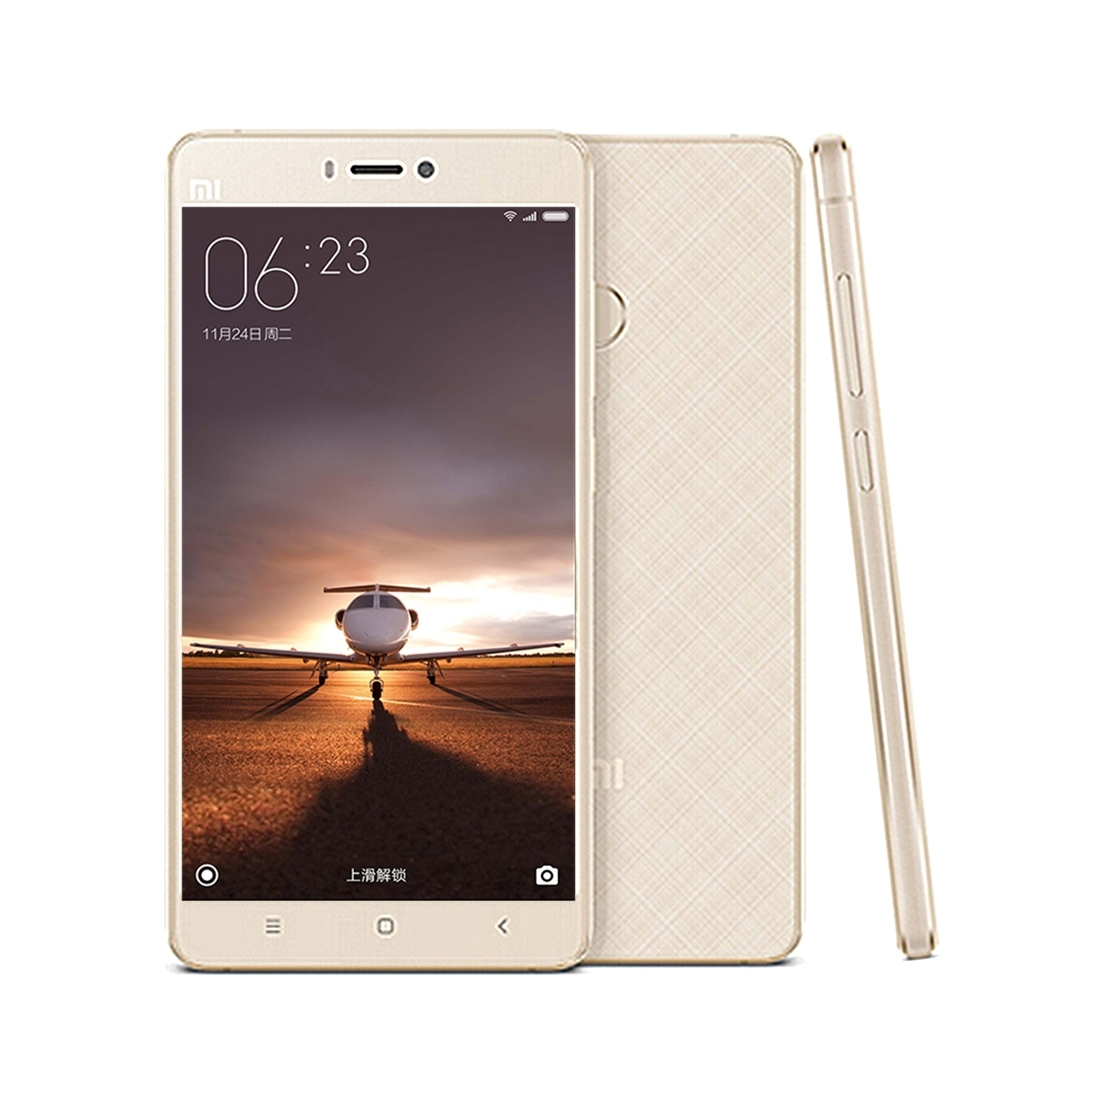 Original Xiaomi 4S 5.0 inch Snapdragon 808 Six Core 1.8GHz MIUI 7.0 OS RAM: 3GB ROM: 64GB 4G LTE WCDMA Phone Call Tablet PC